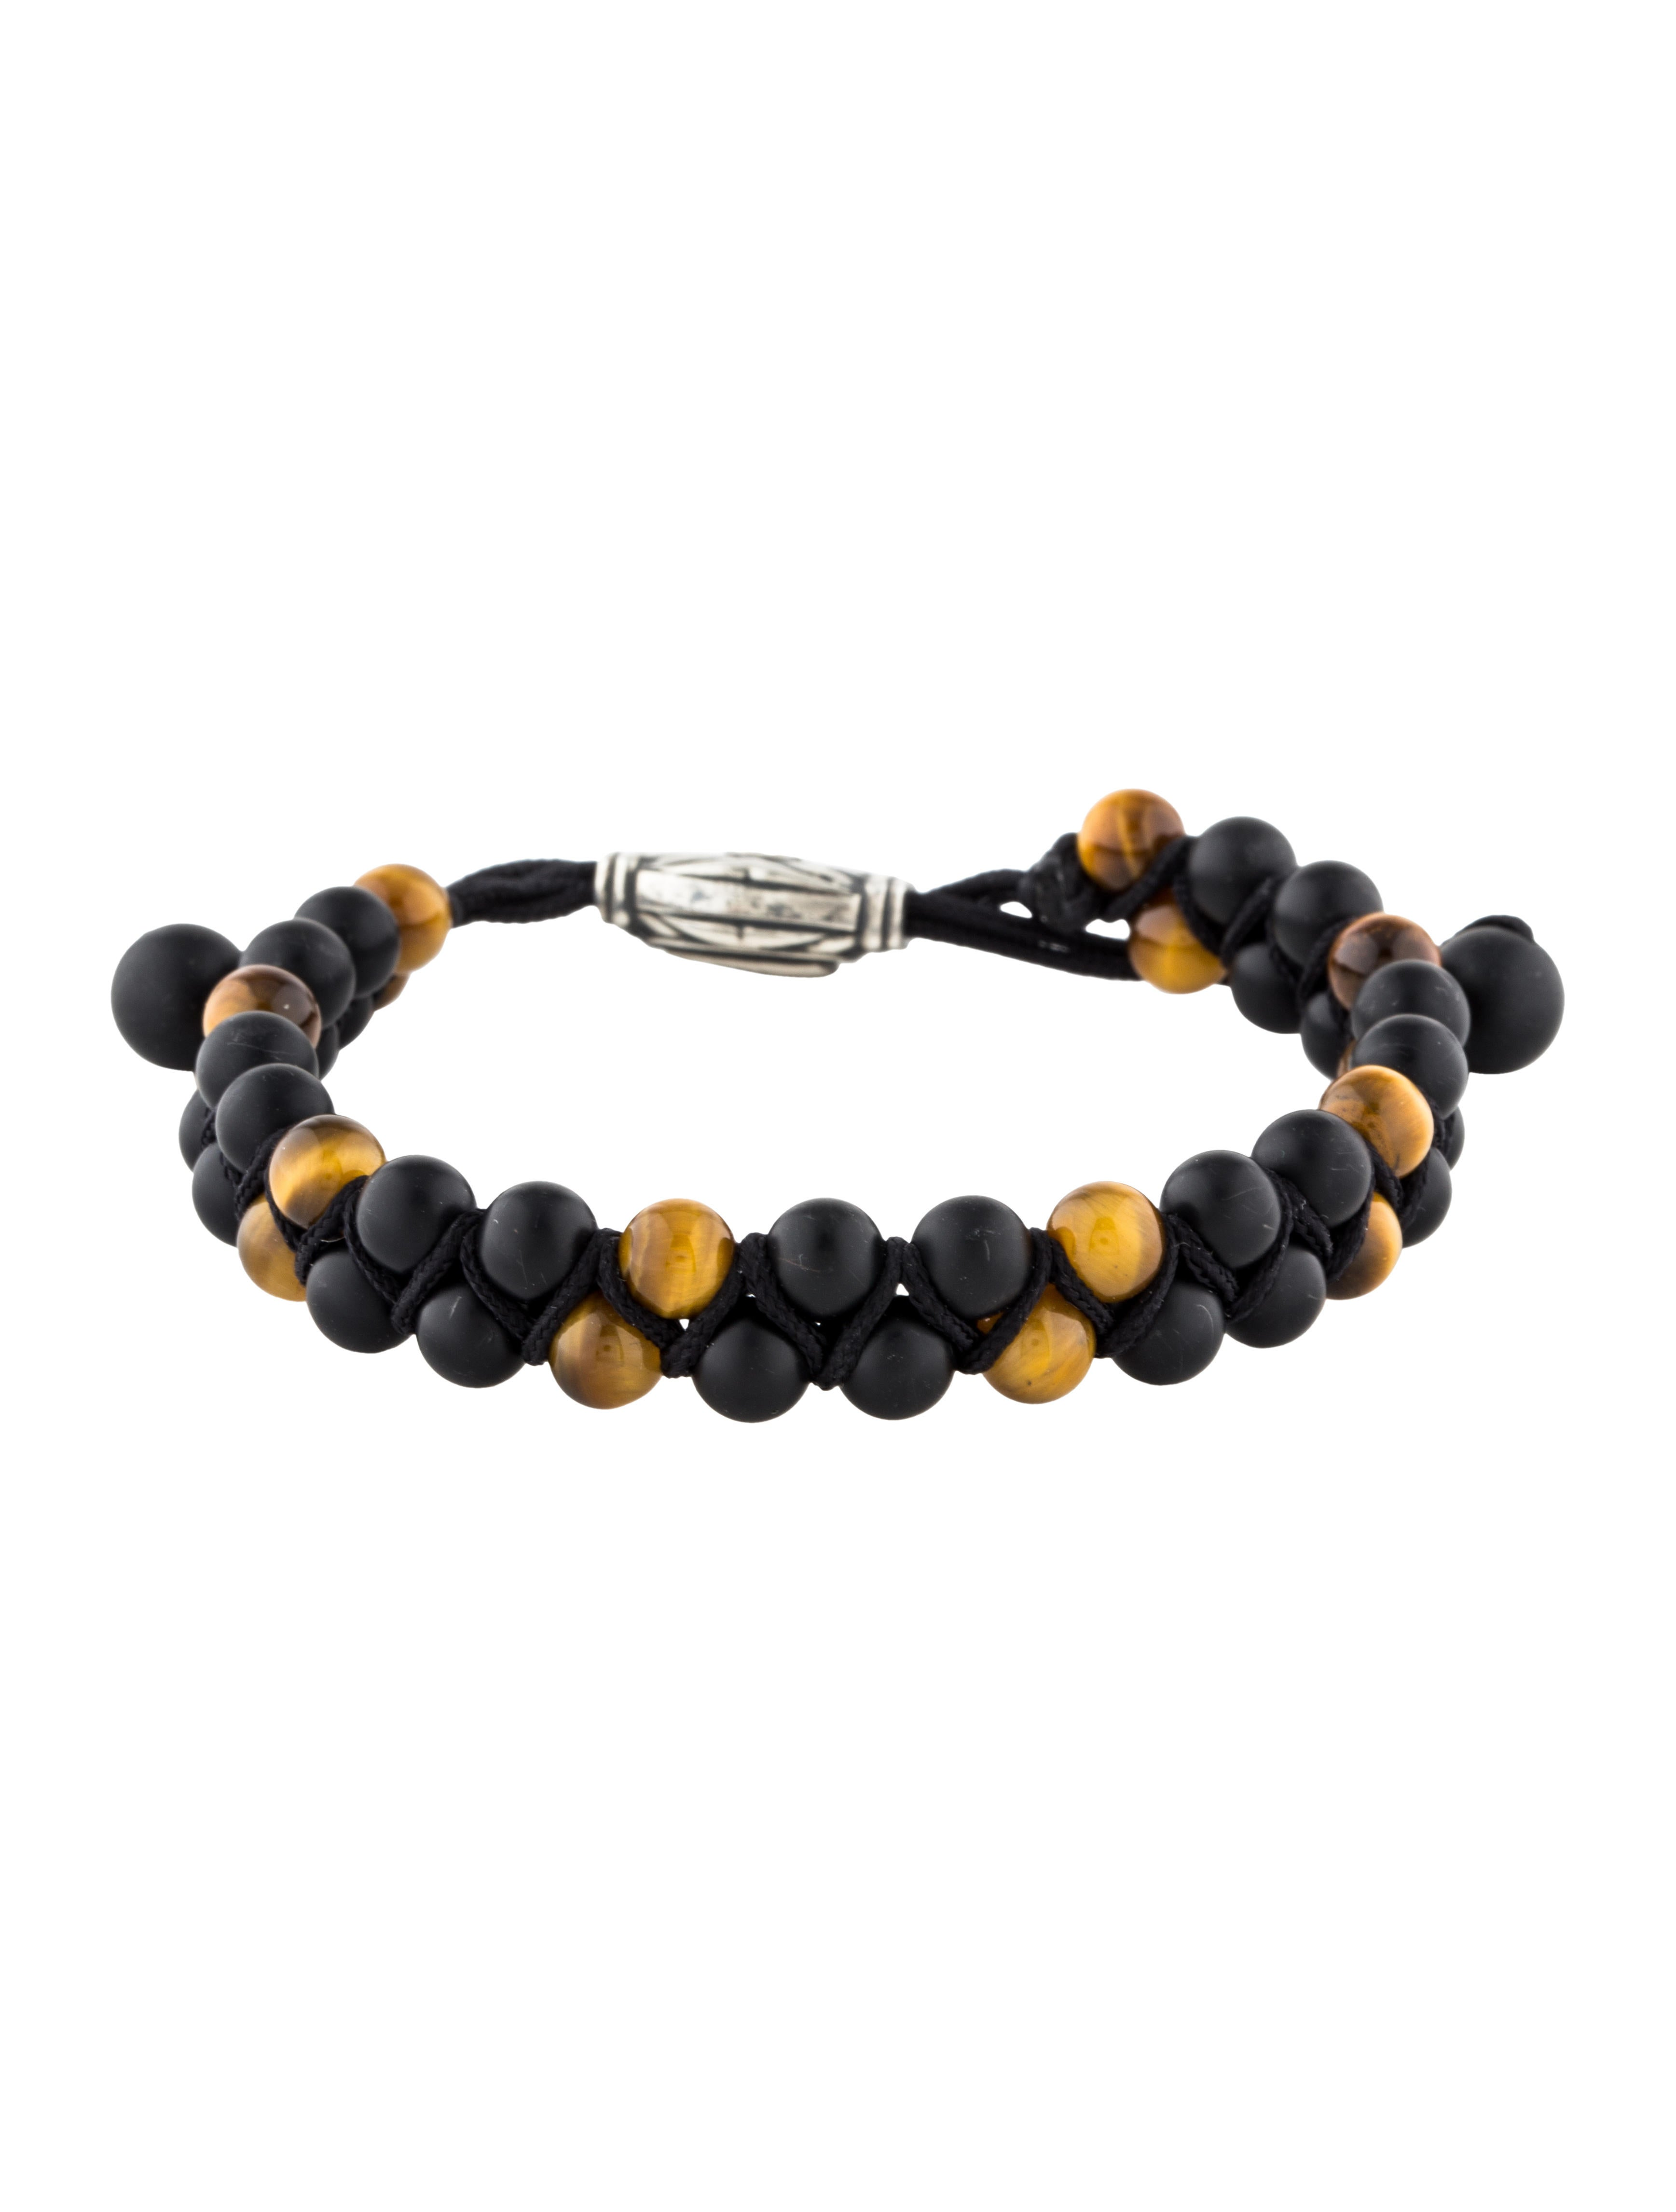 b3ae31d5eea36 Onyx & Tiger's Eye Spiritual Beads Two-Row Bracelet